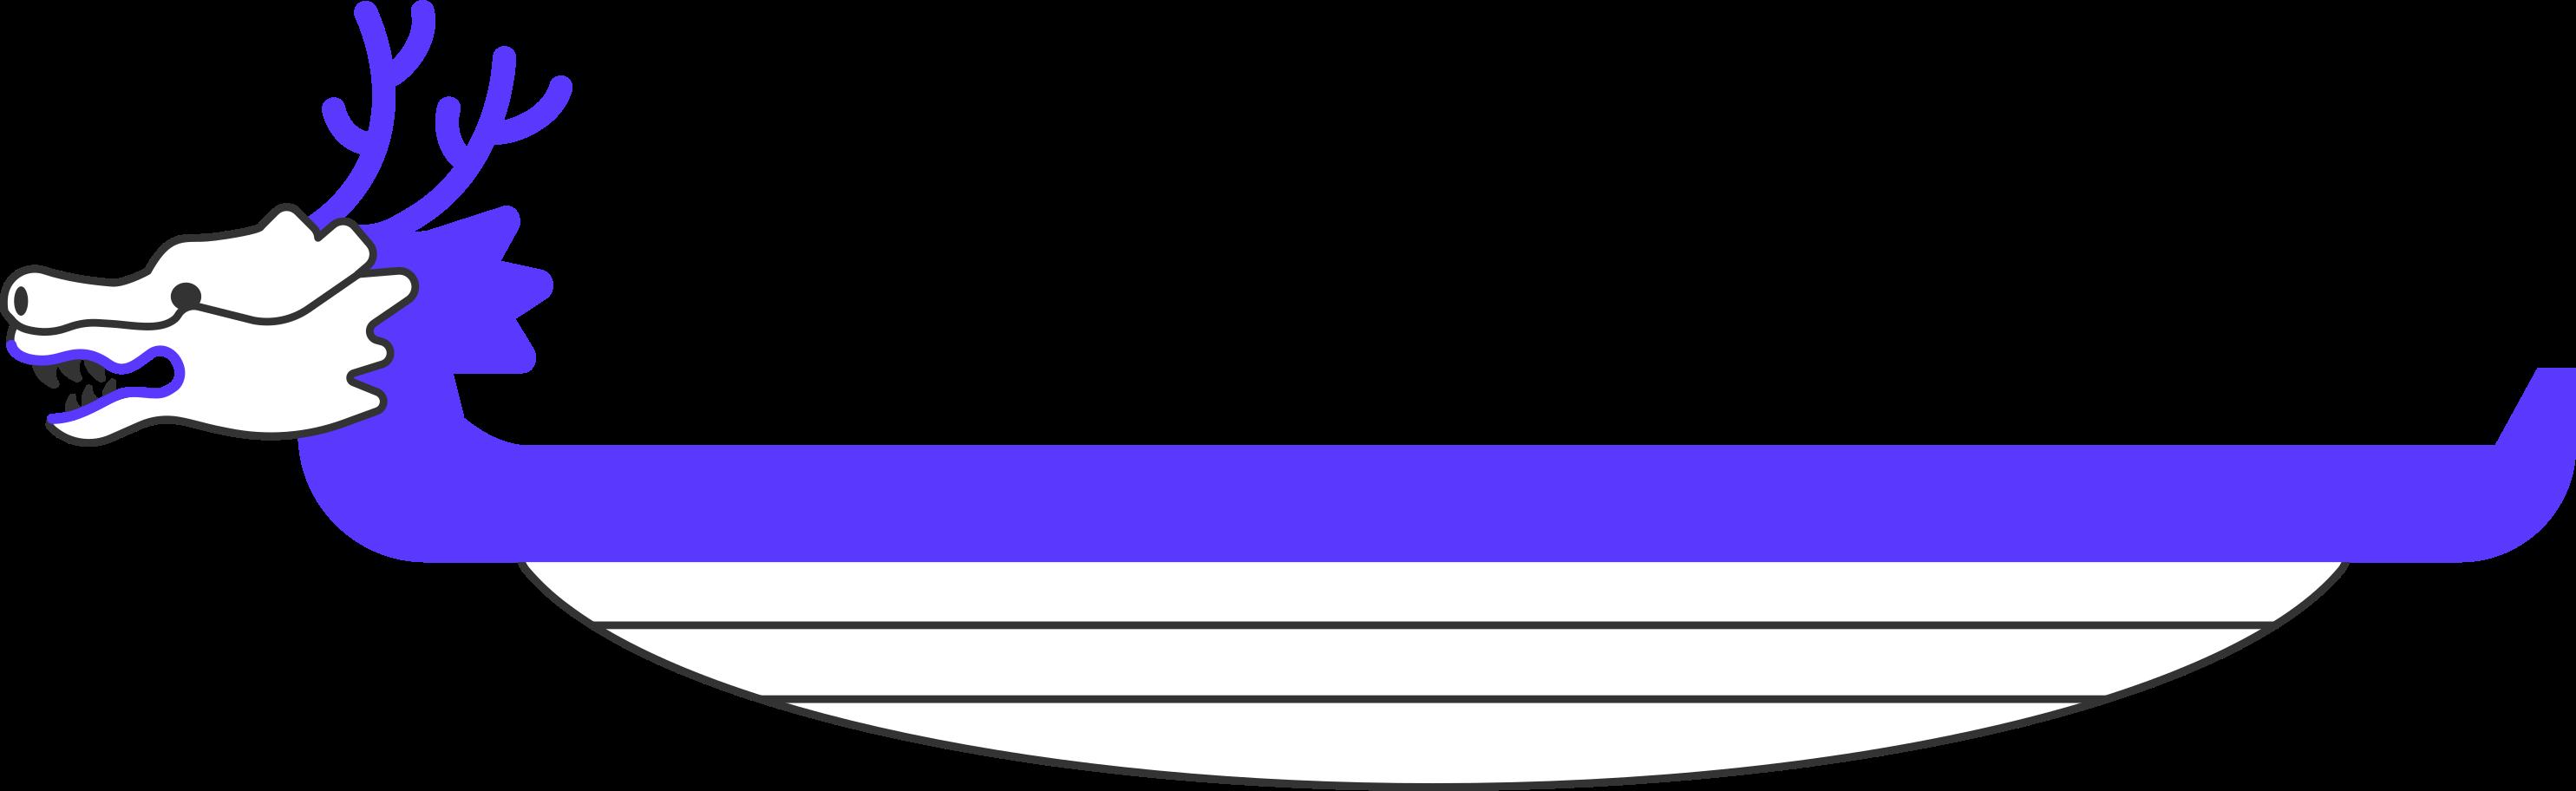 dragon boat Clipart illustration in PNG, SVG